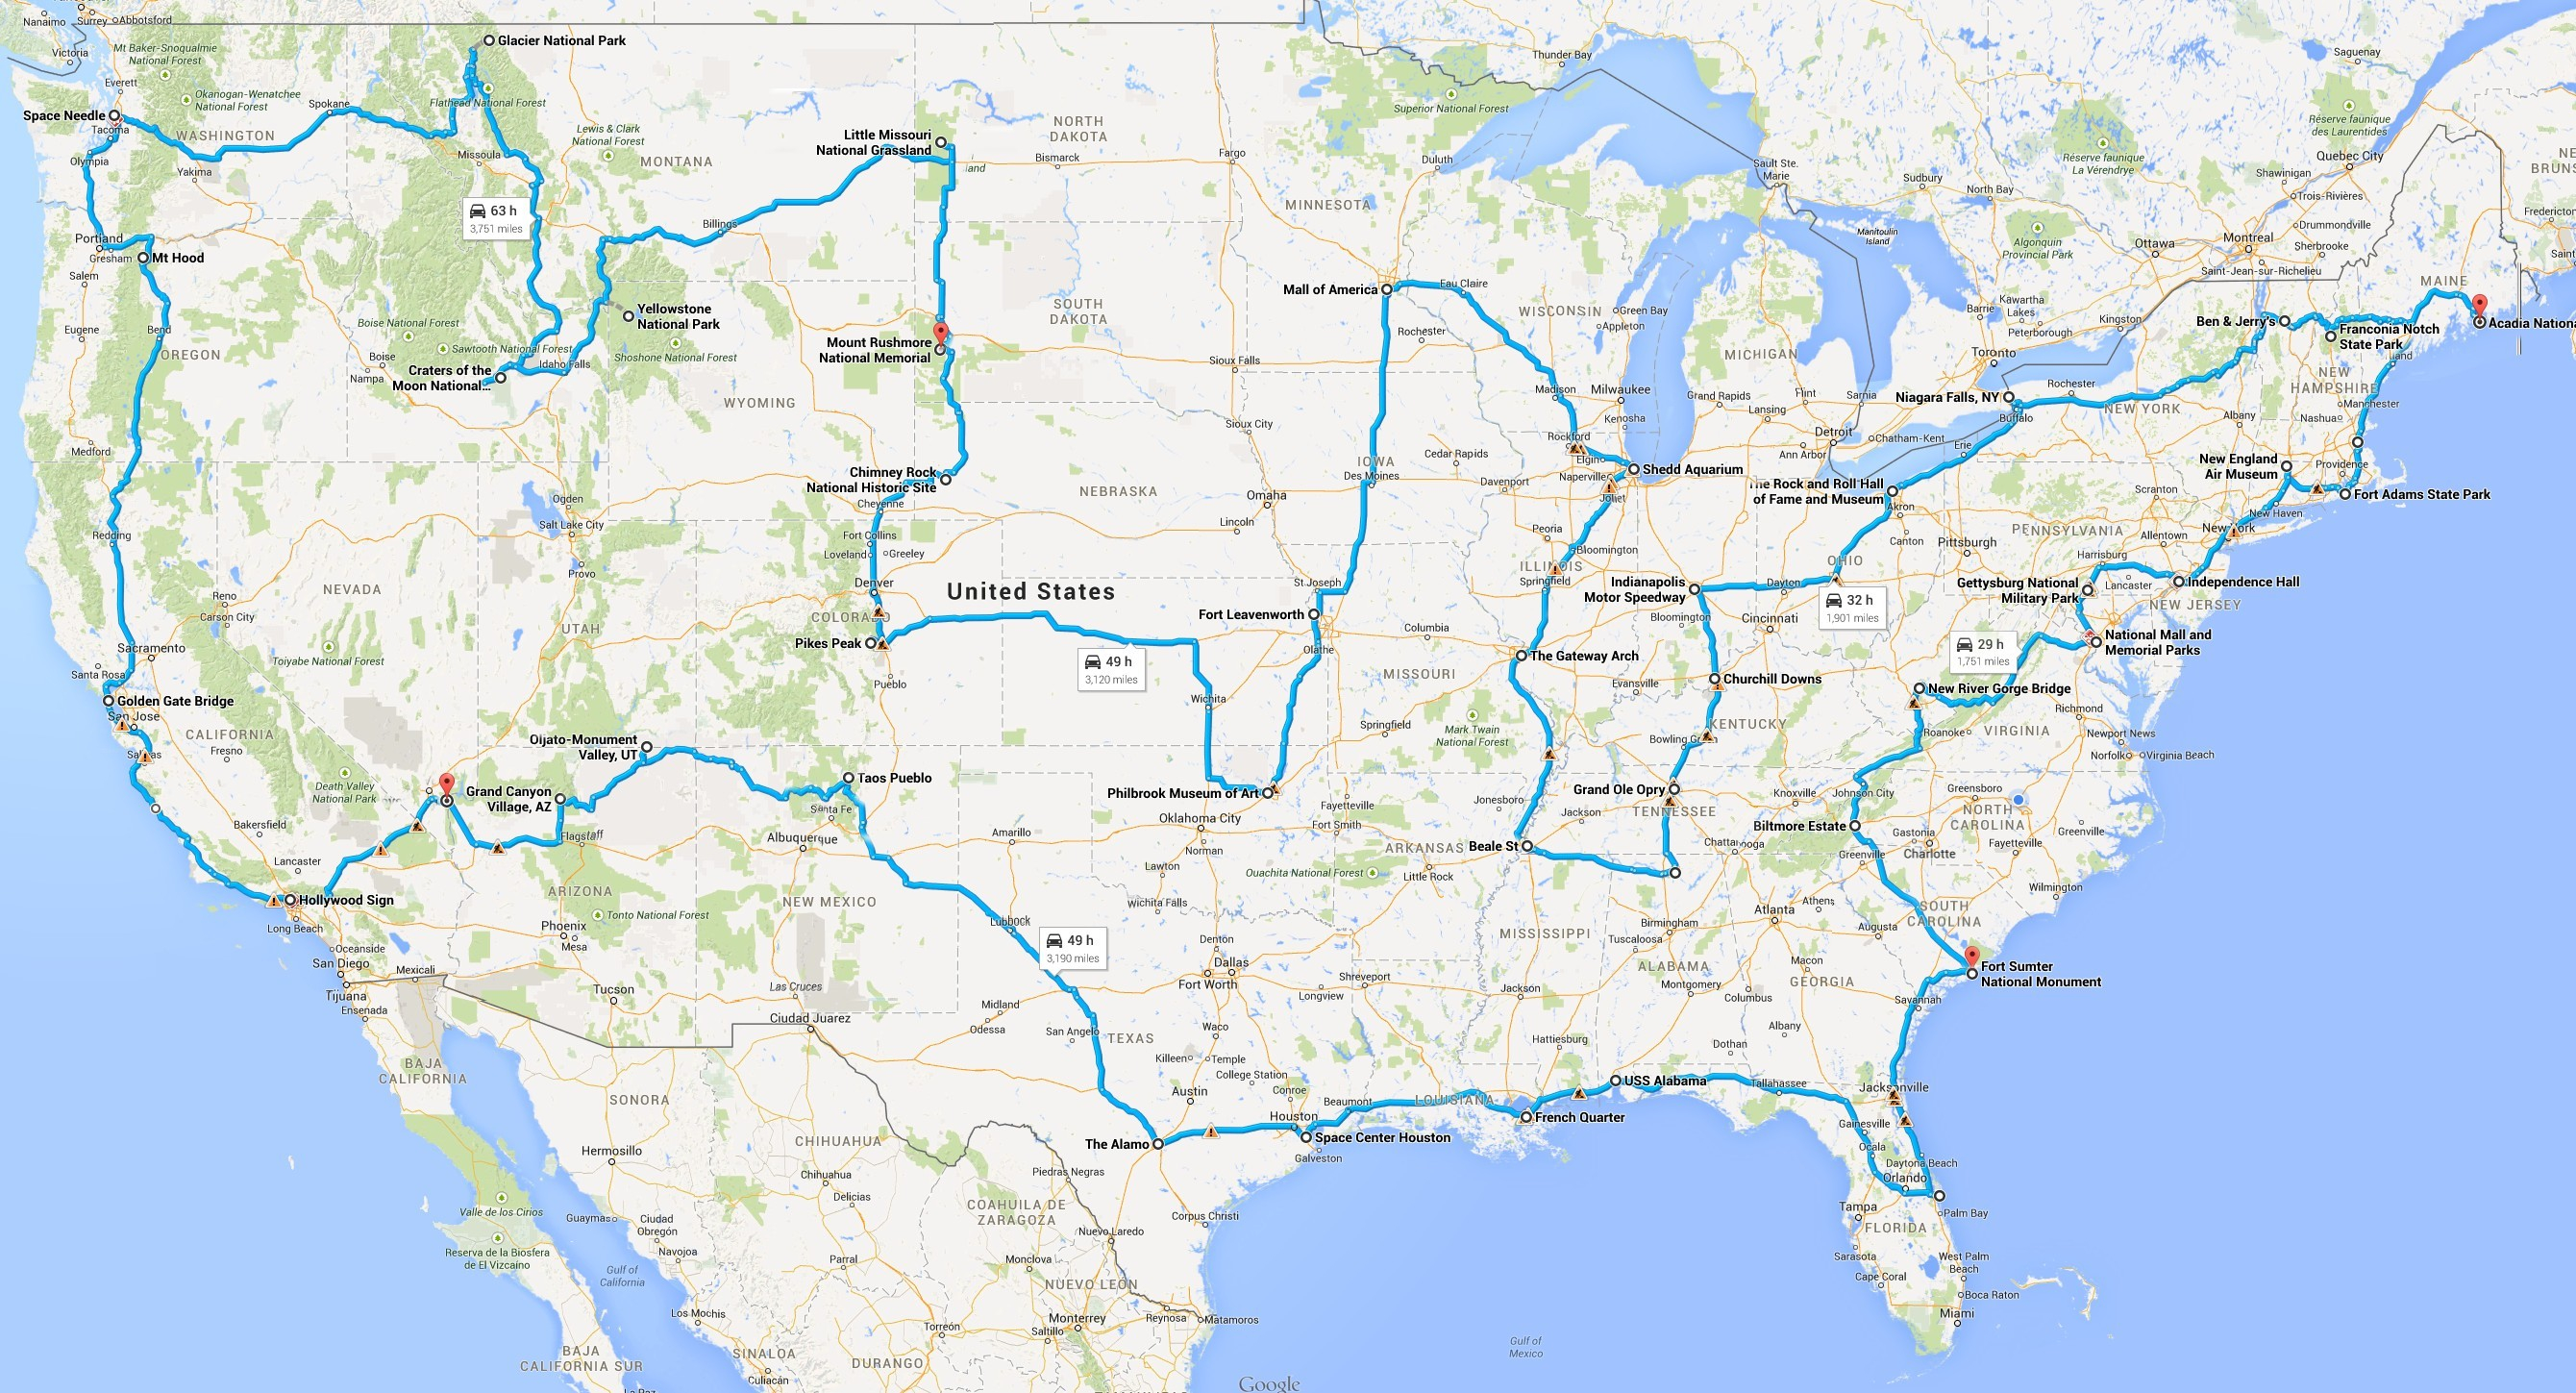 Google Map Of World Download New Maps Usa States Florida And 7 - Google Maps Hollywood Florida